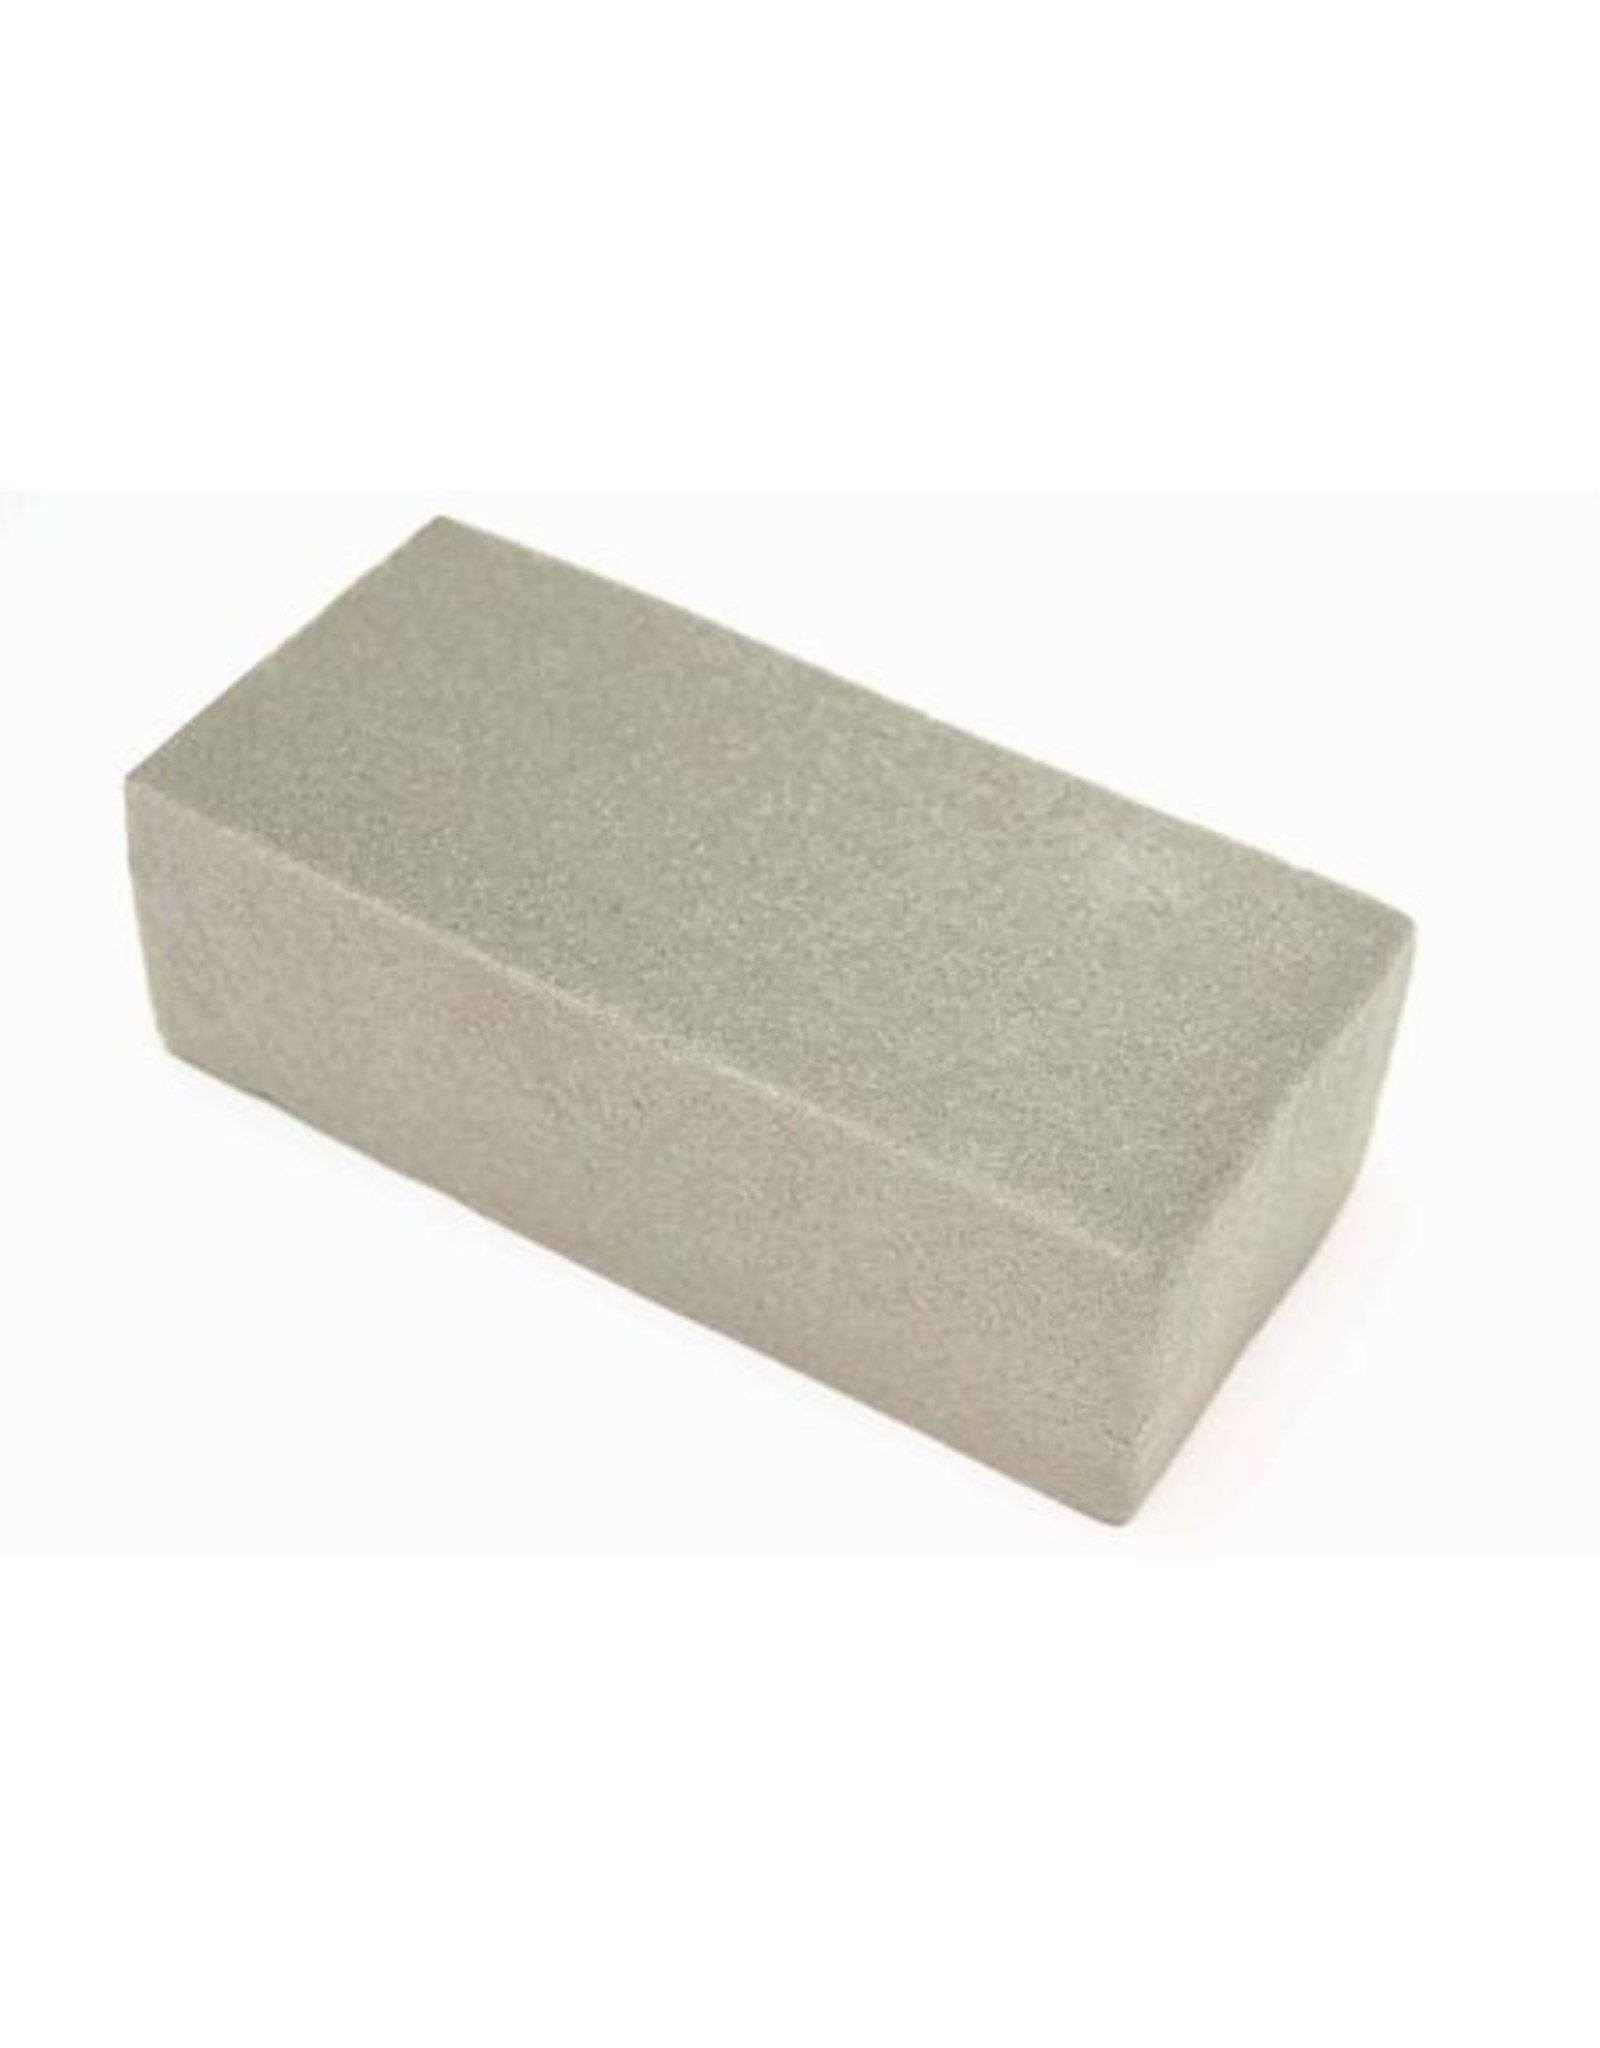 HD Basic Brick Dry Sld Foam ↑20.0 Ø10.0 ↑7.5 (x 20)